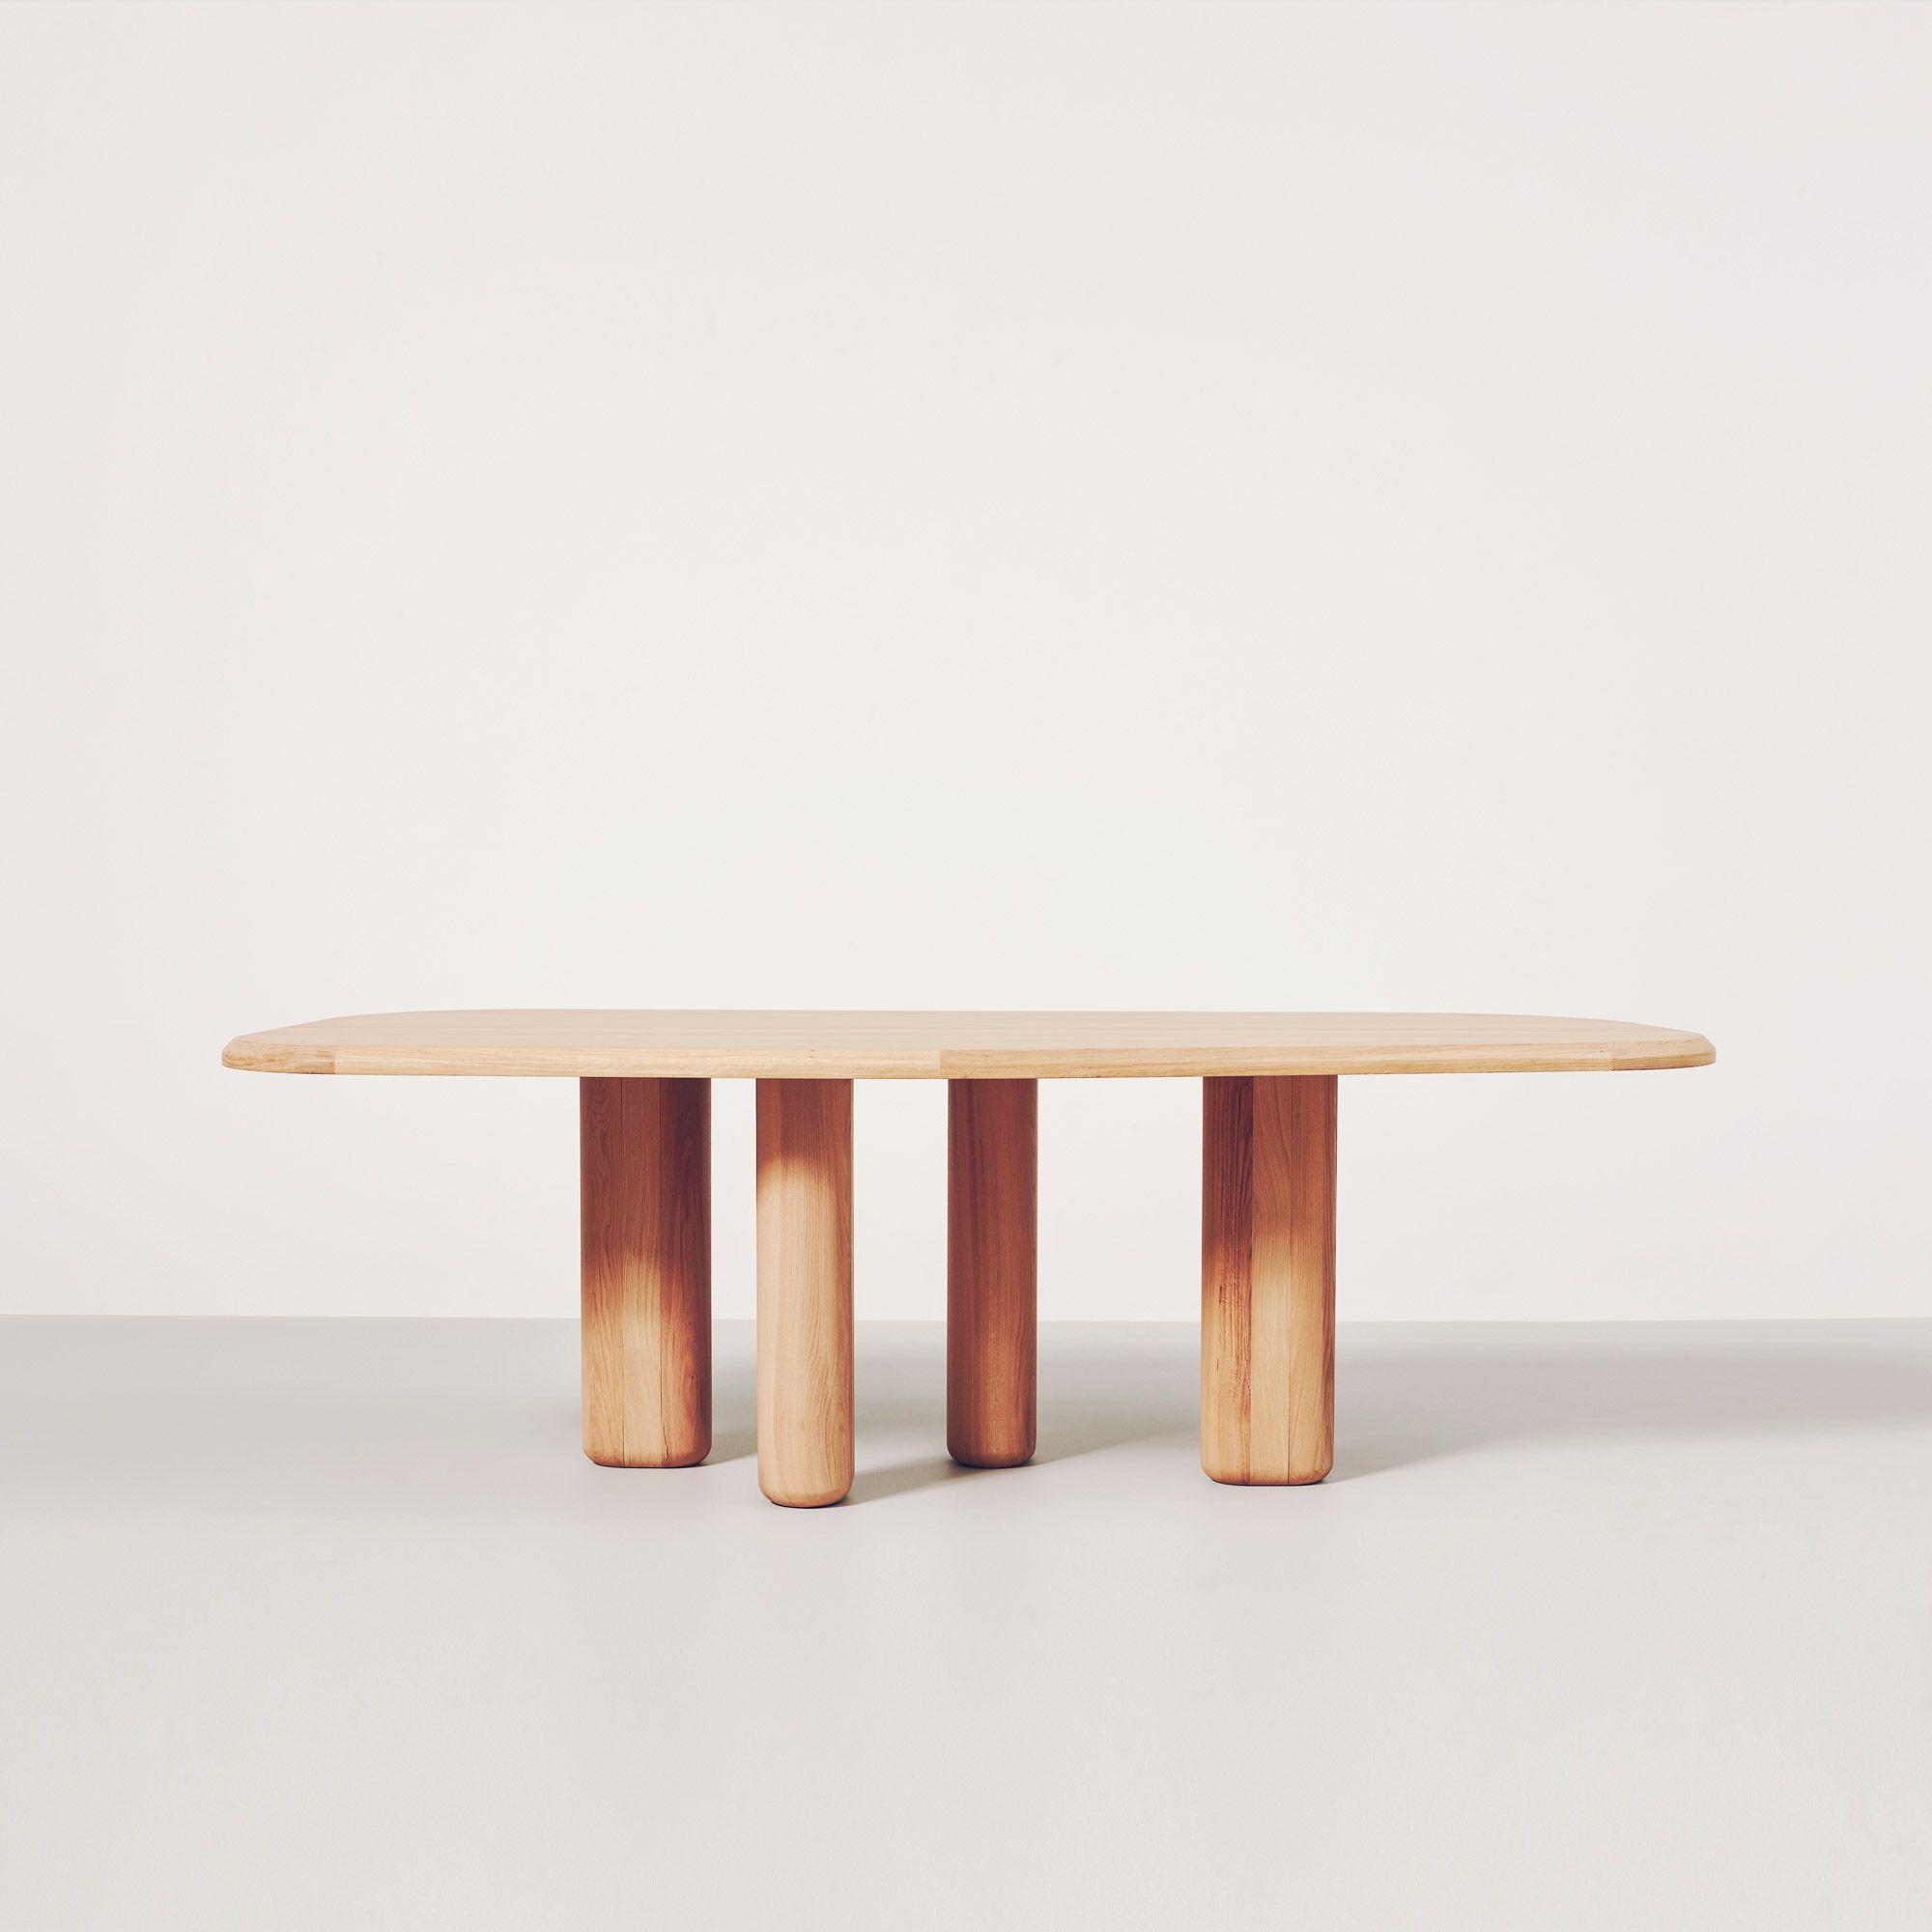 Rough Dining Table By Collection Particulaire Mobilier De Salon Table Salle A Manger Meuble Fait Main